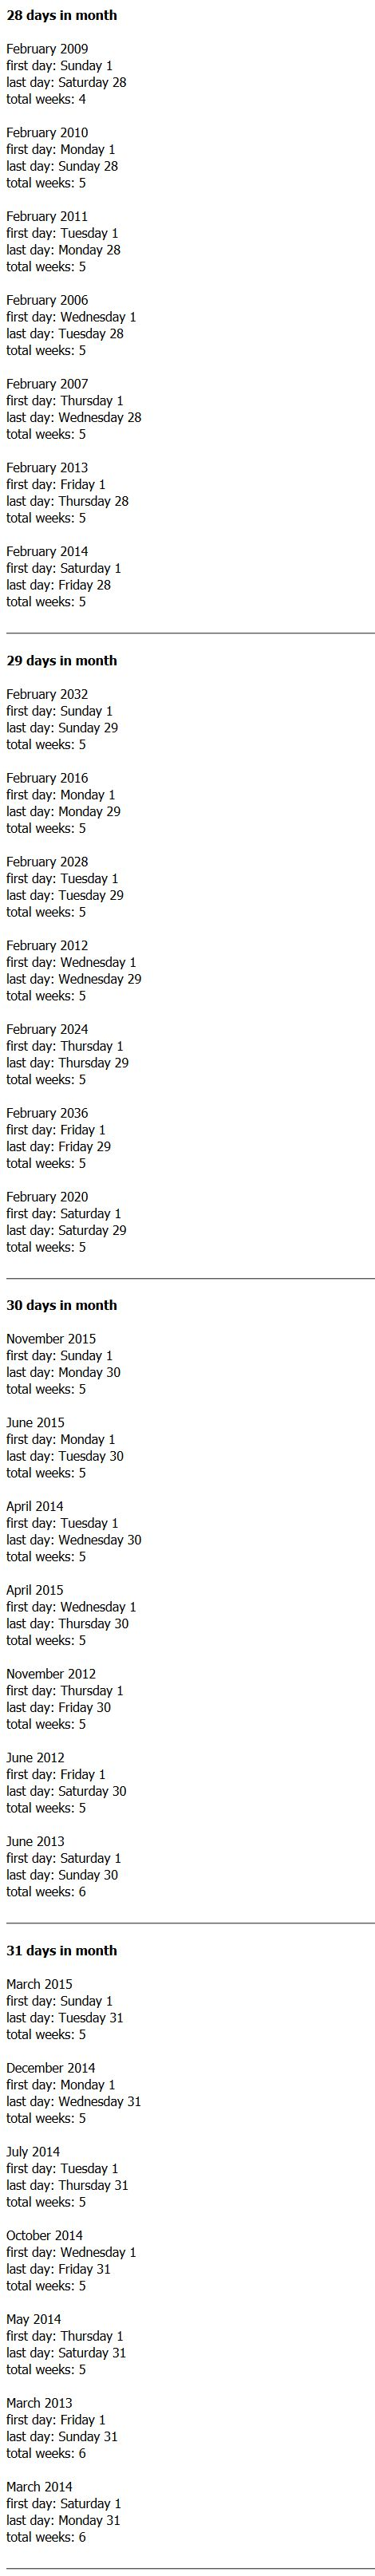 weeks in month test result